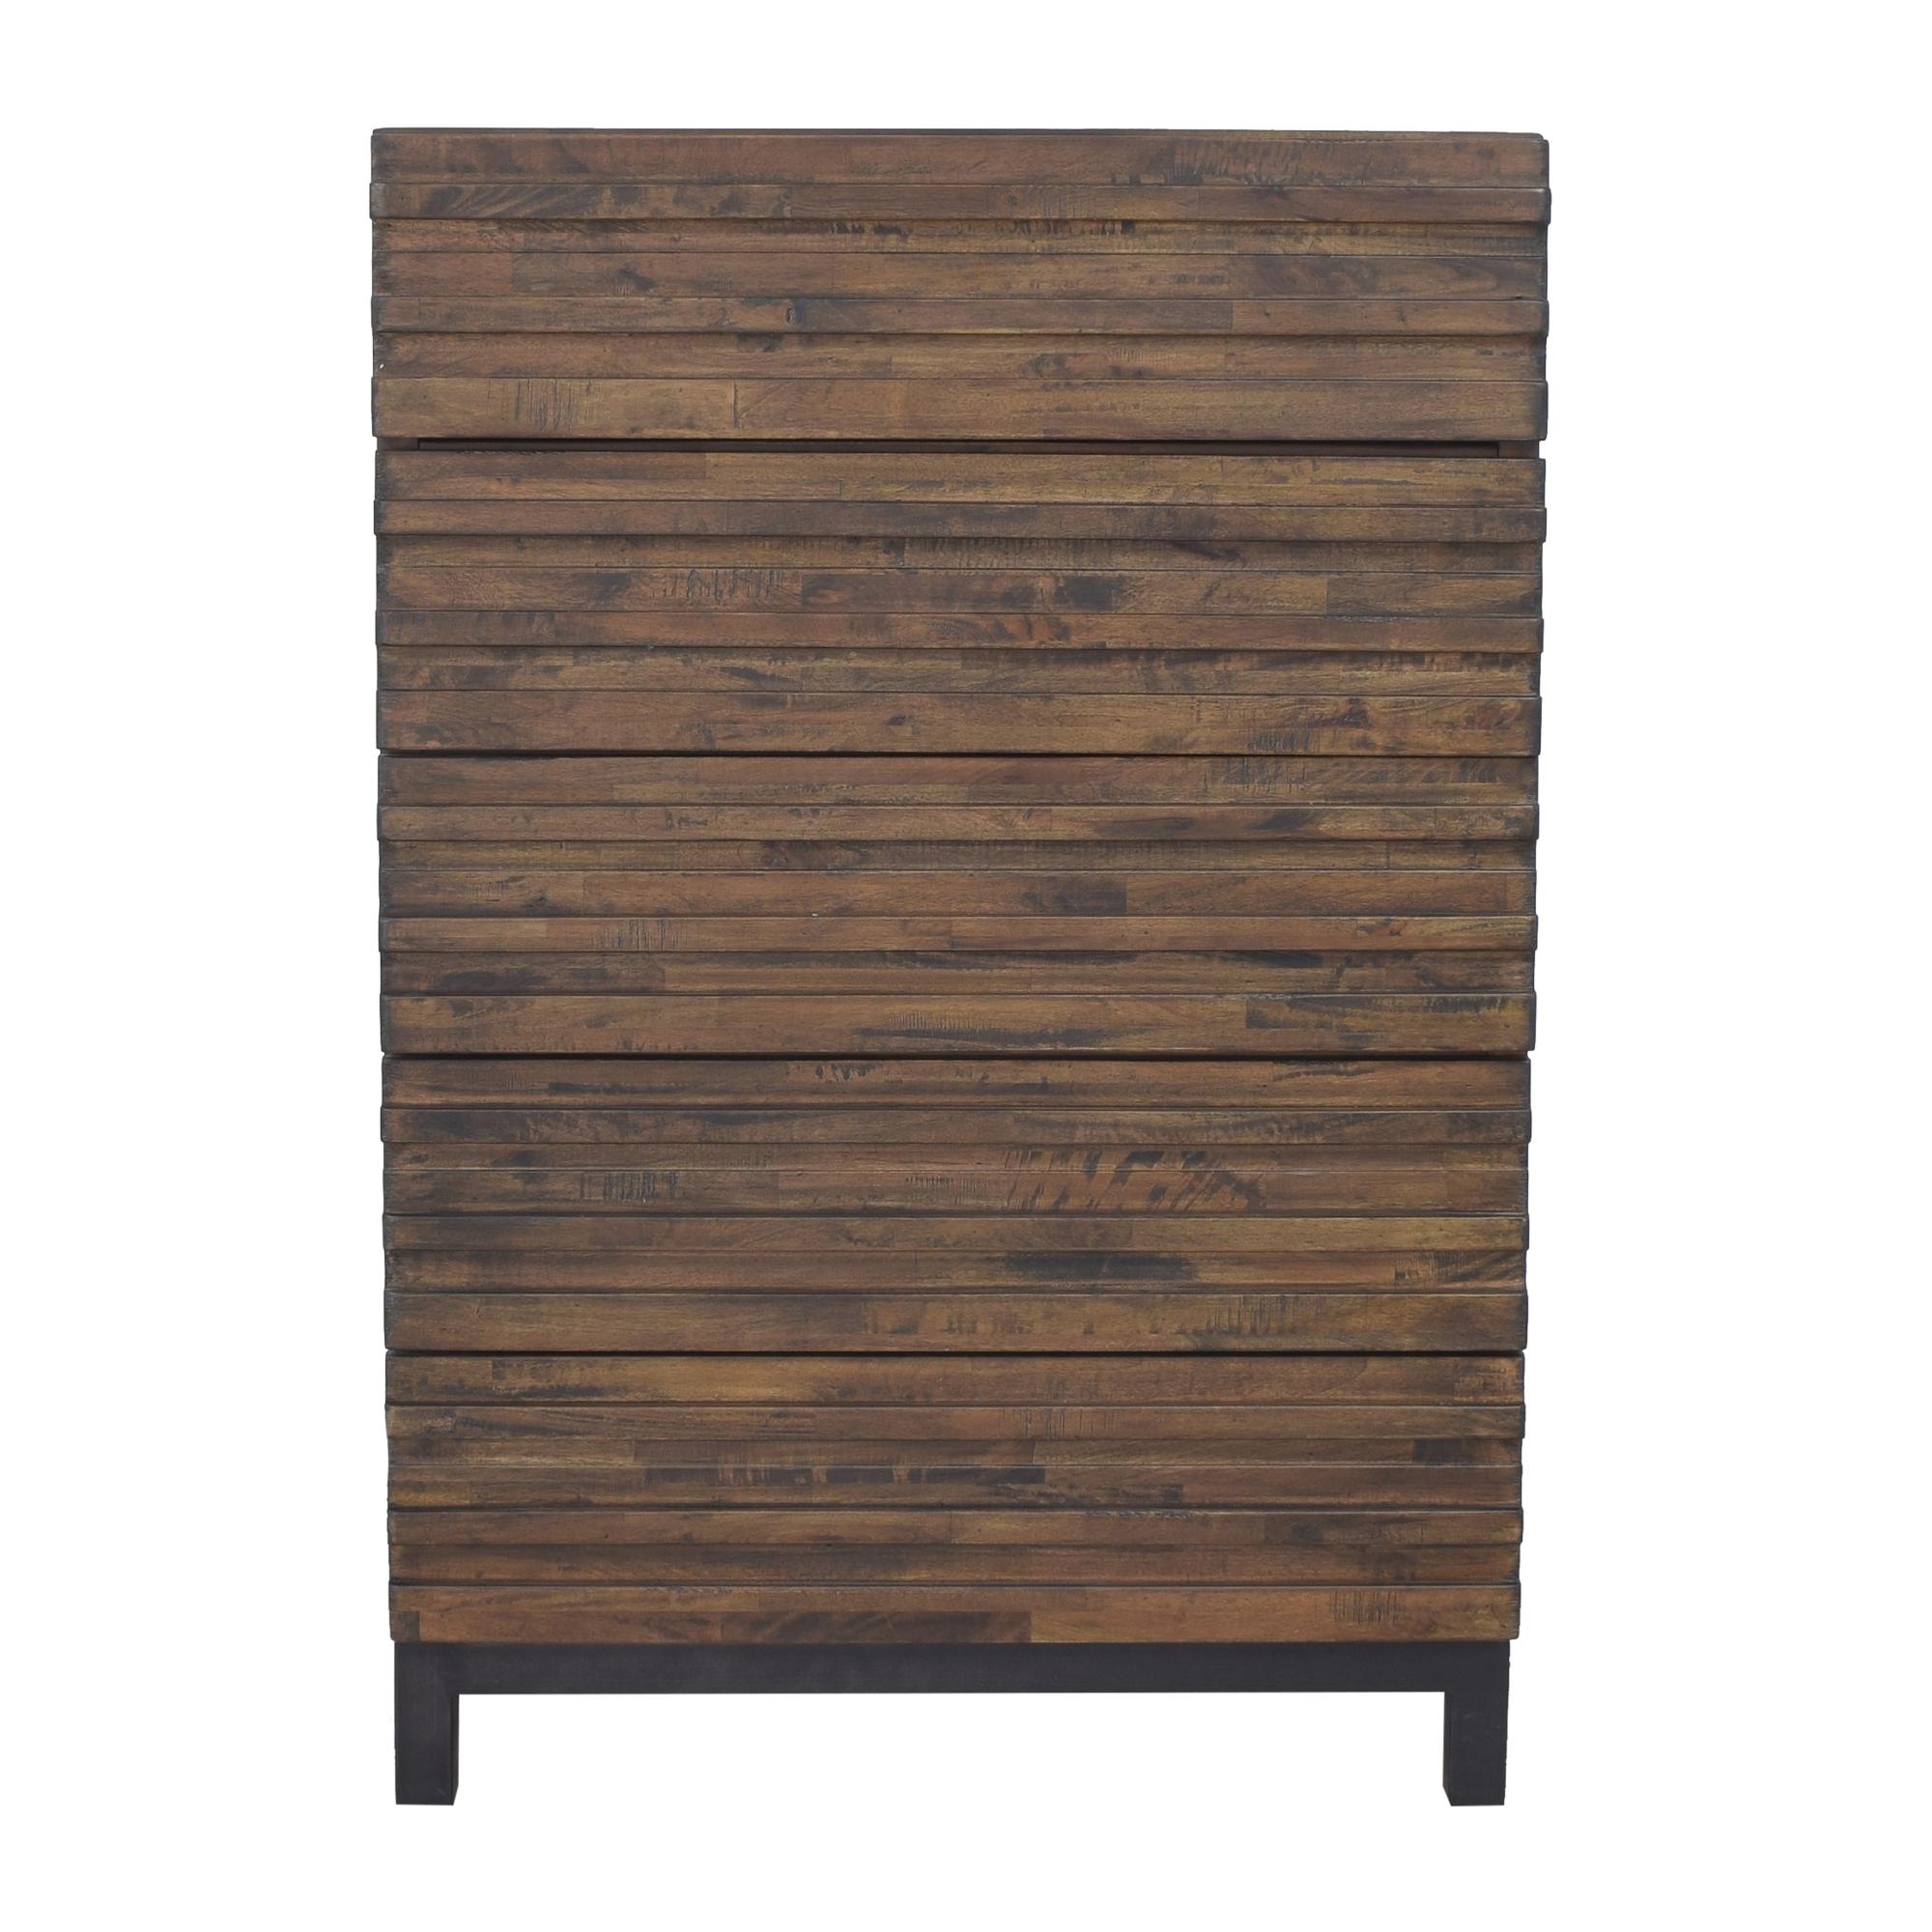 Raymour & Flanigan Raymour & Flanigan Nara Five Drawer Chest Dressers